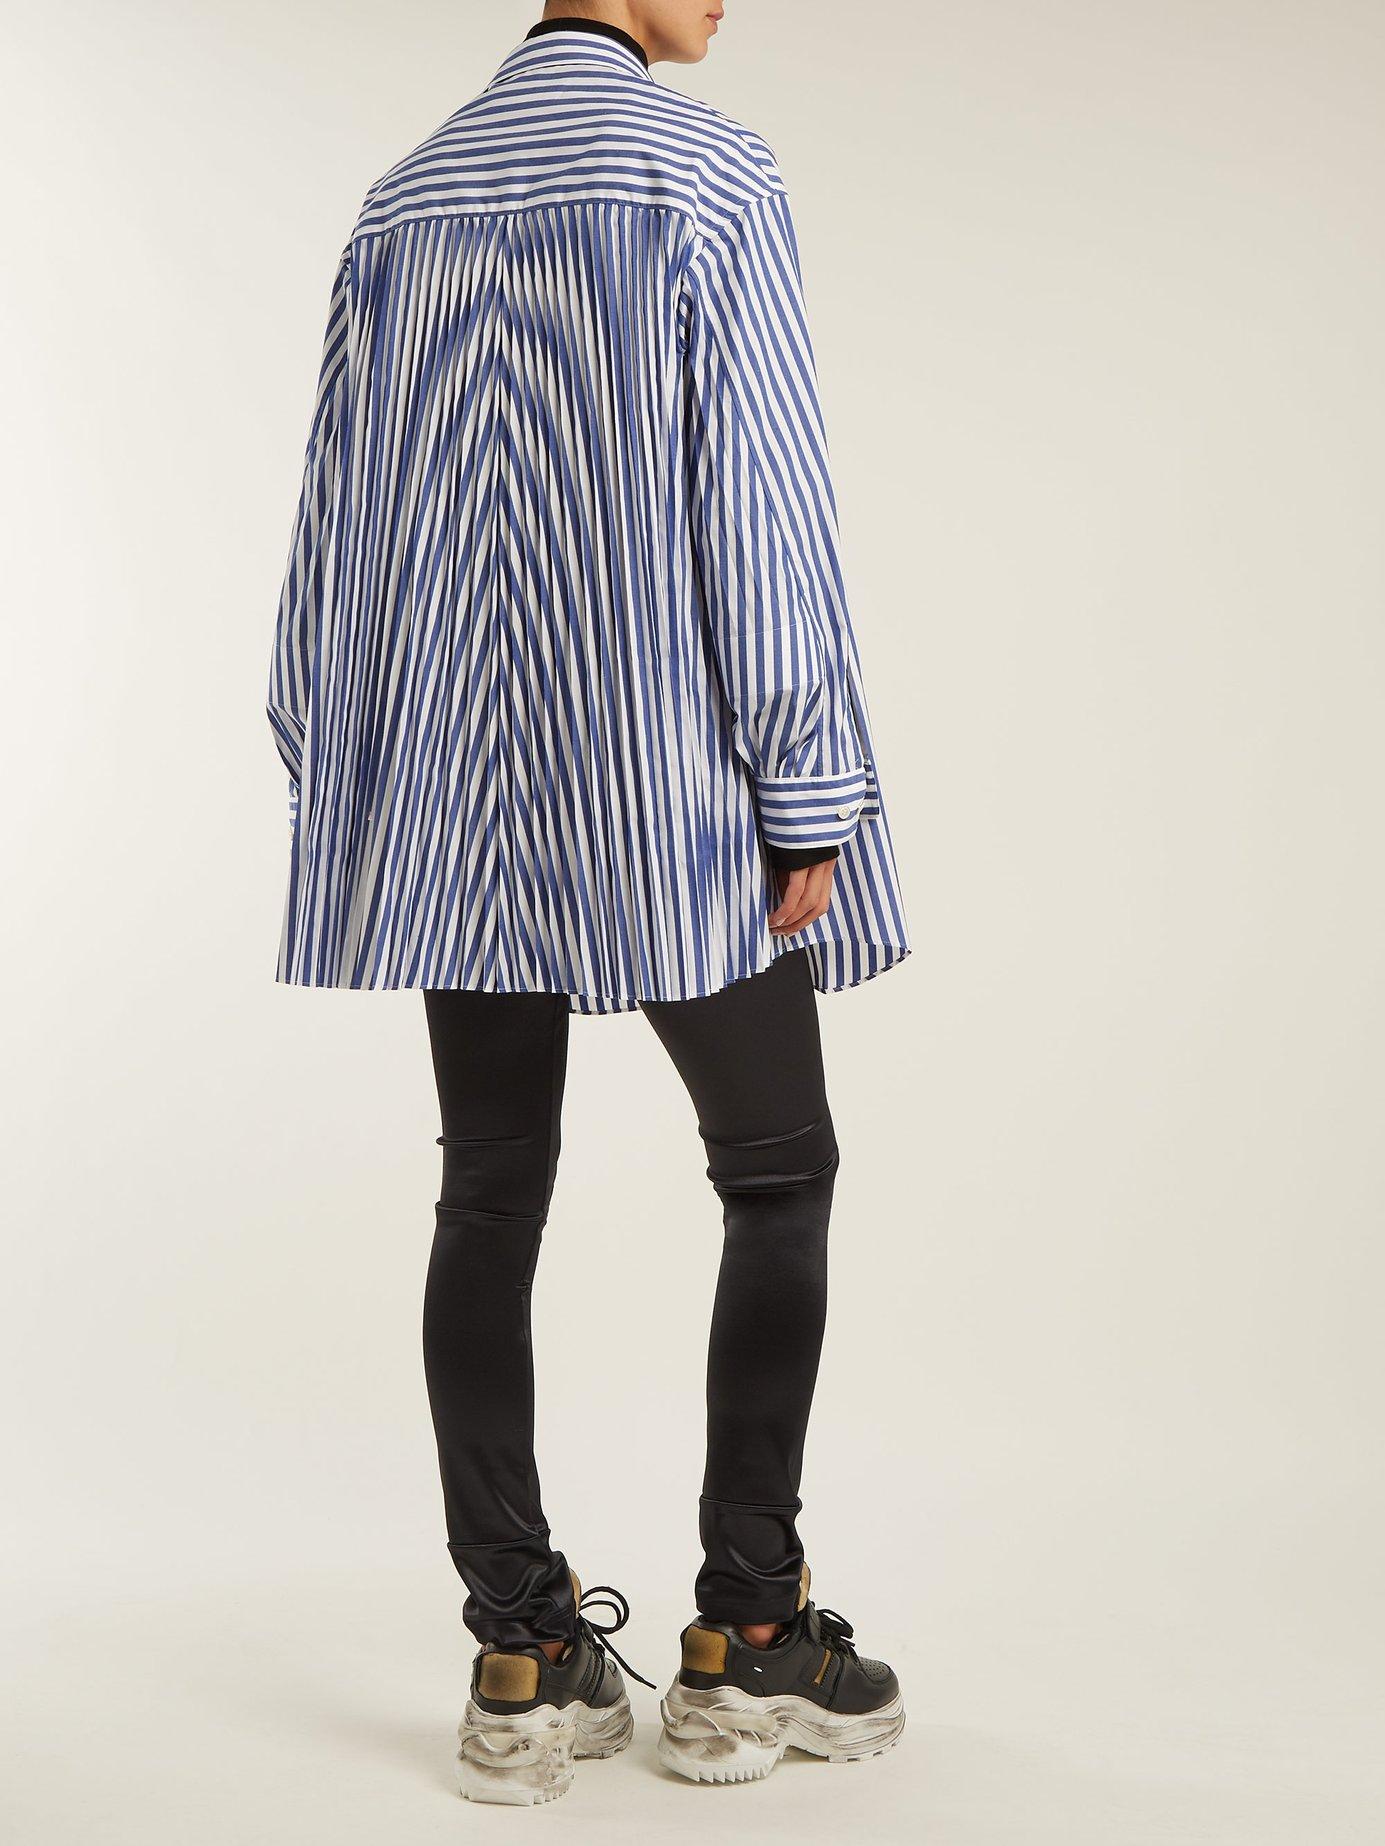 Oversized striped poplin shirt by Junya Watanabe